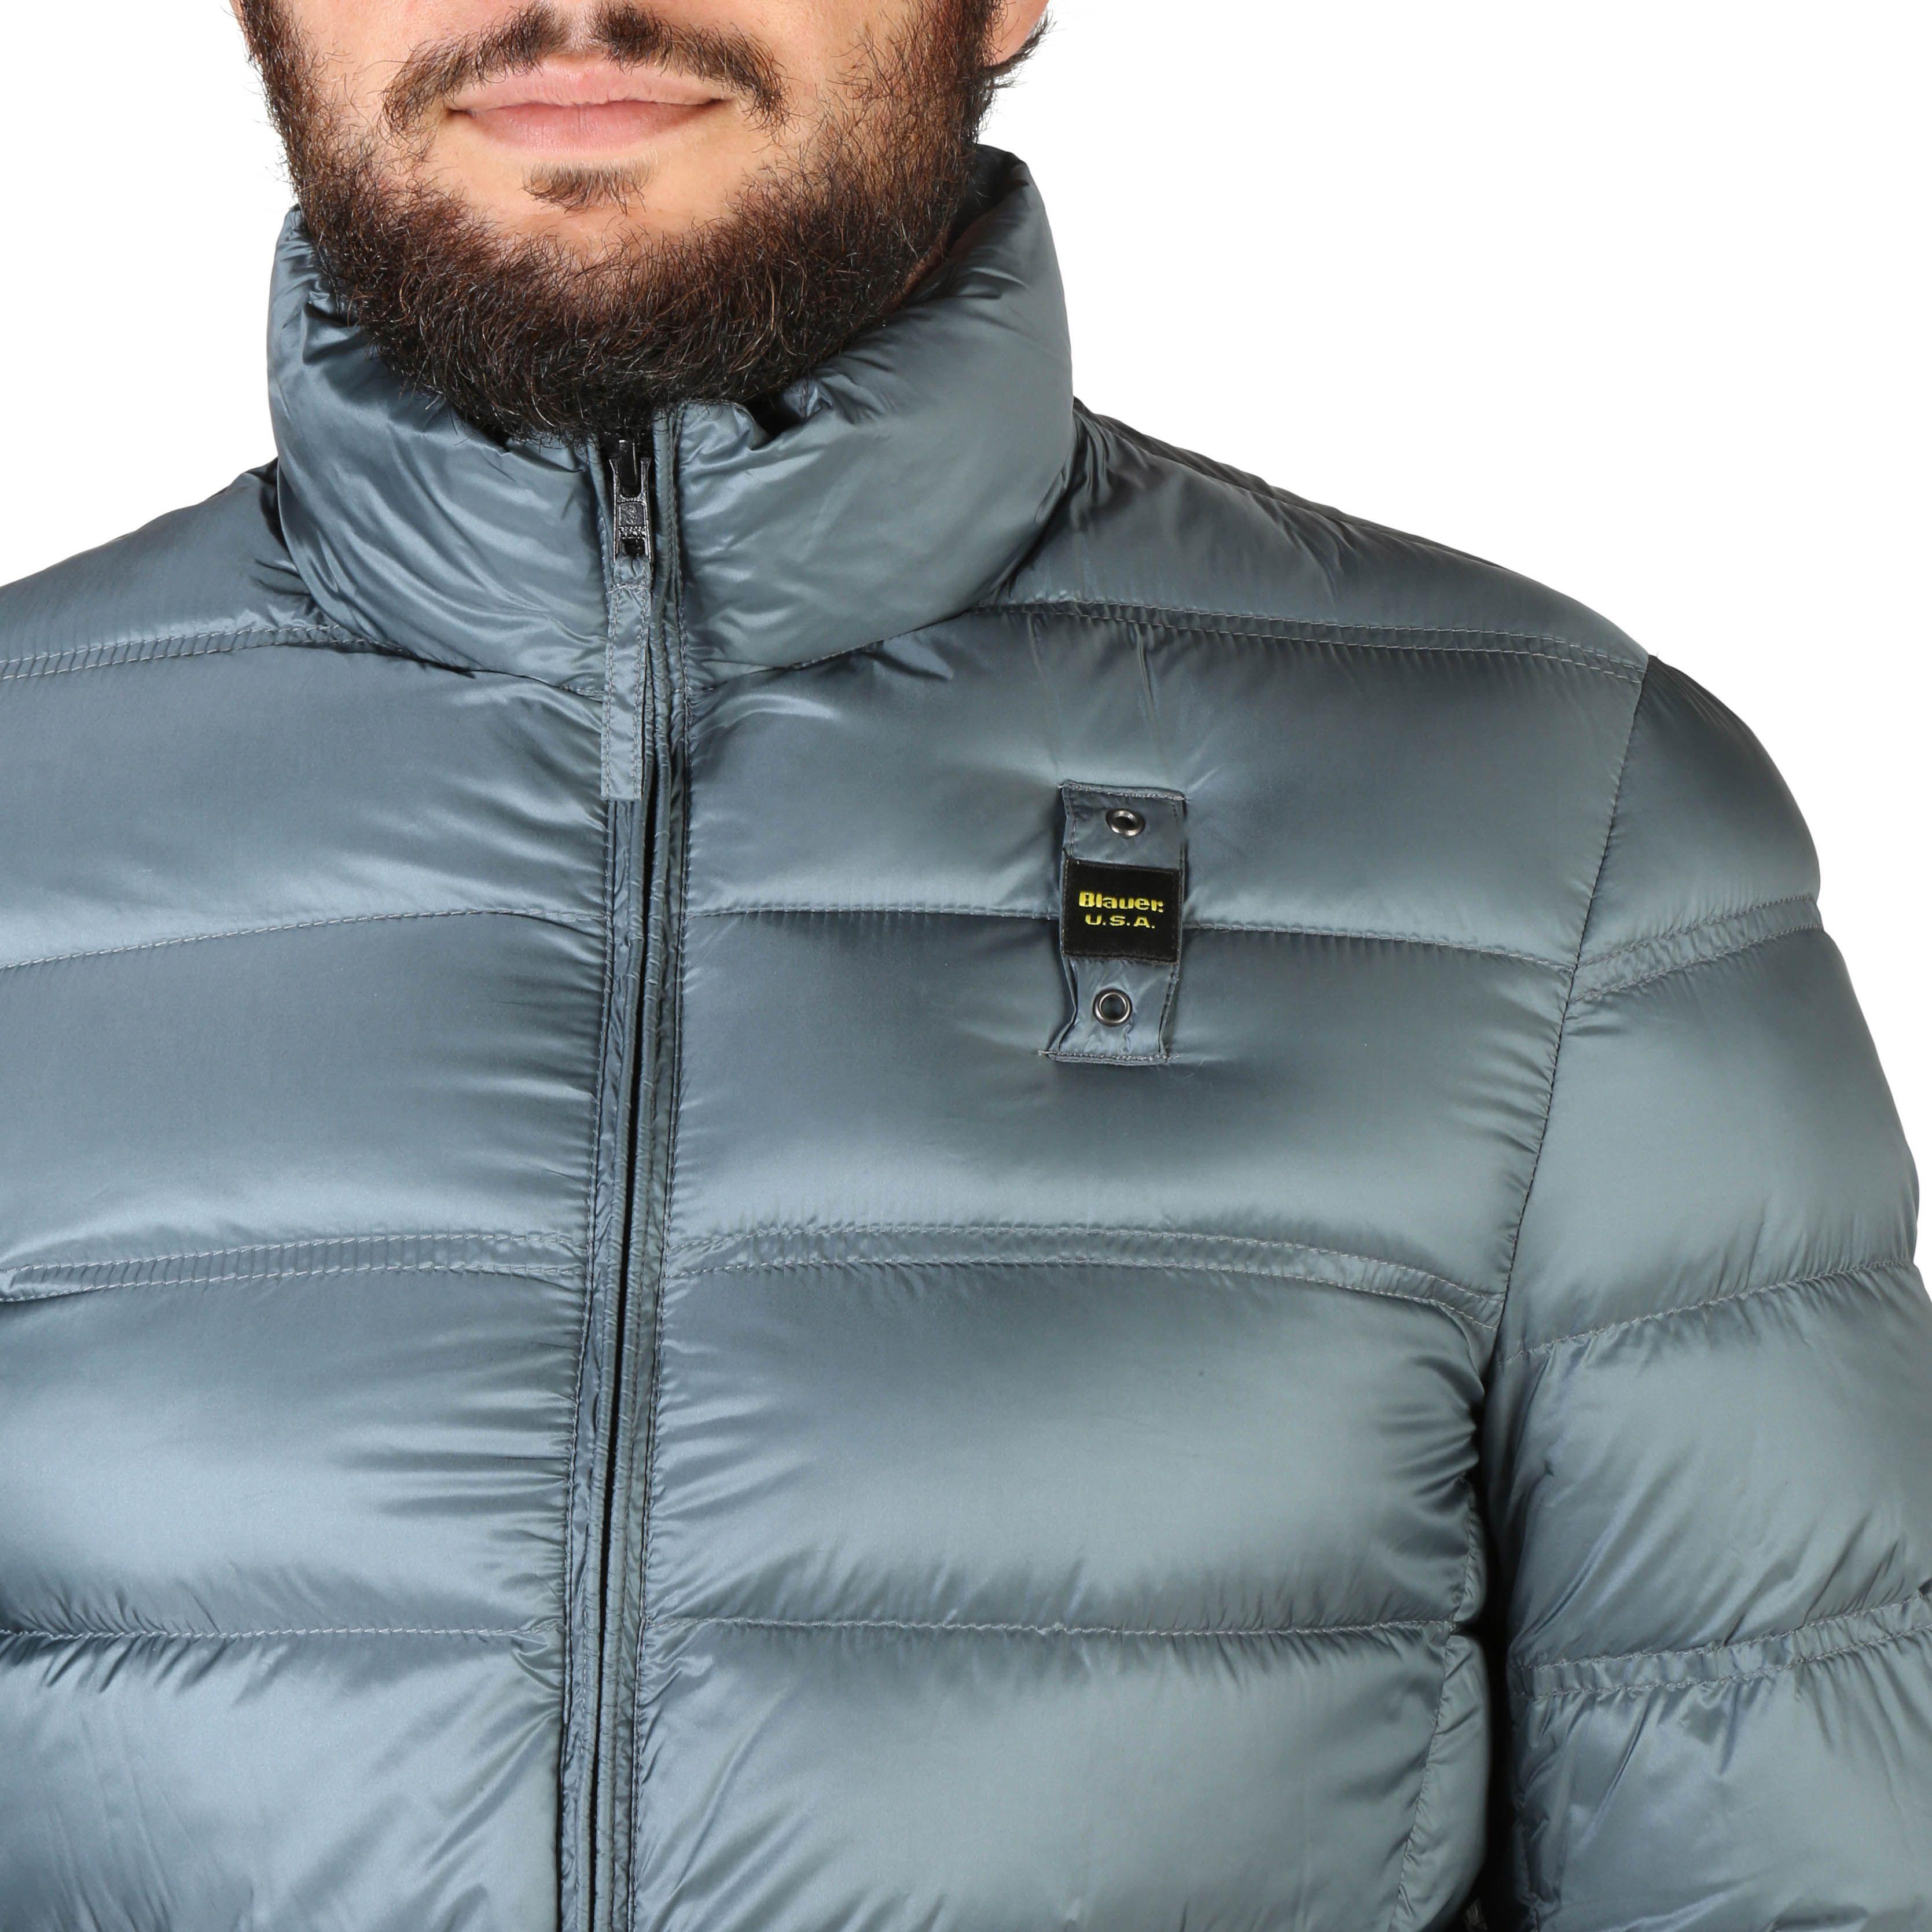 Clothing Blauer – 19WBLUC03031